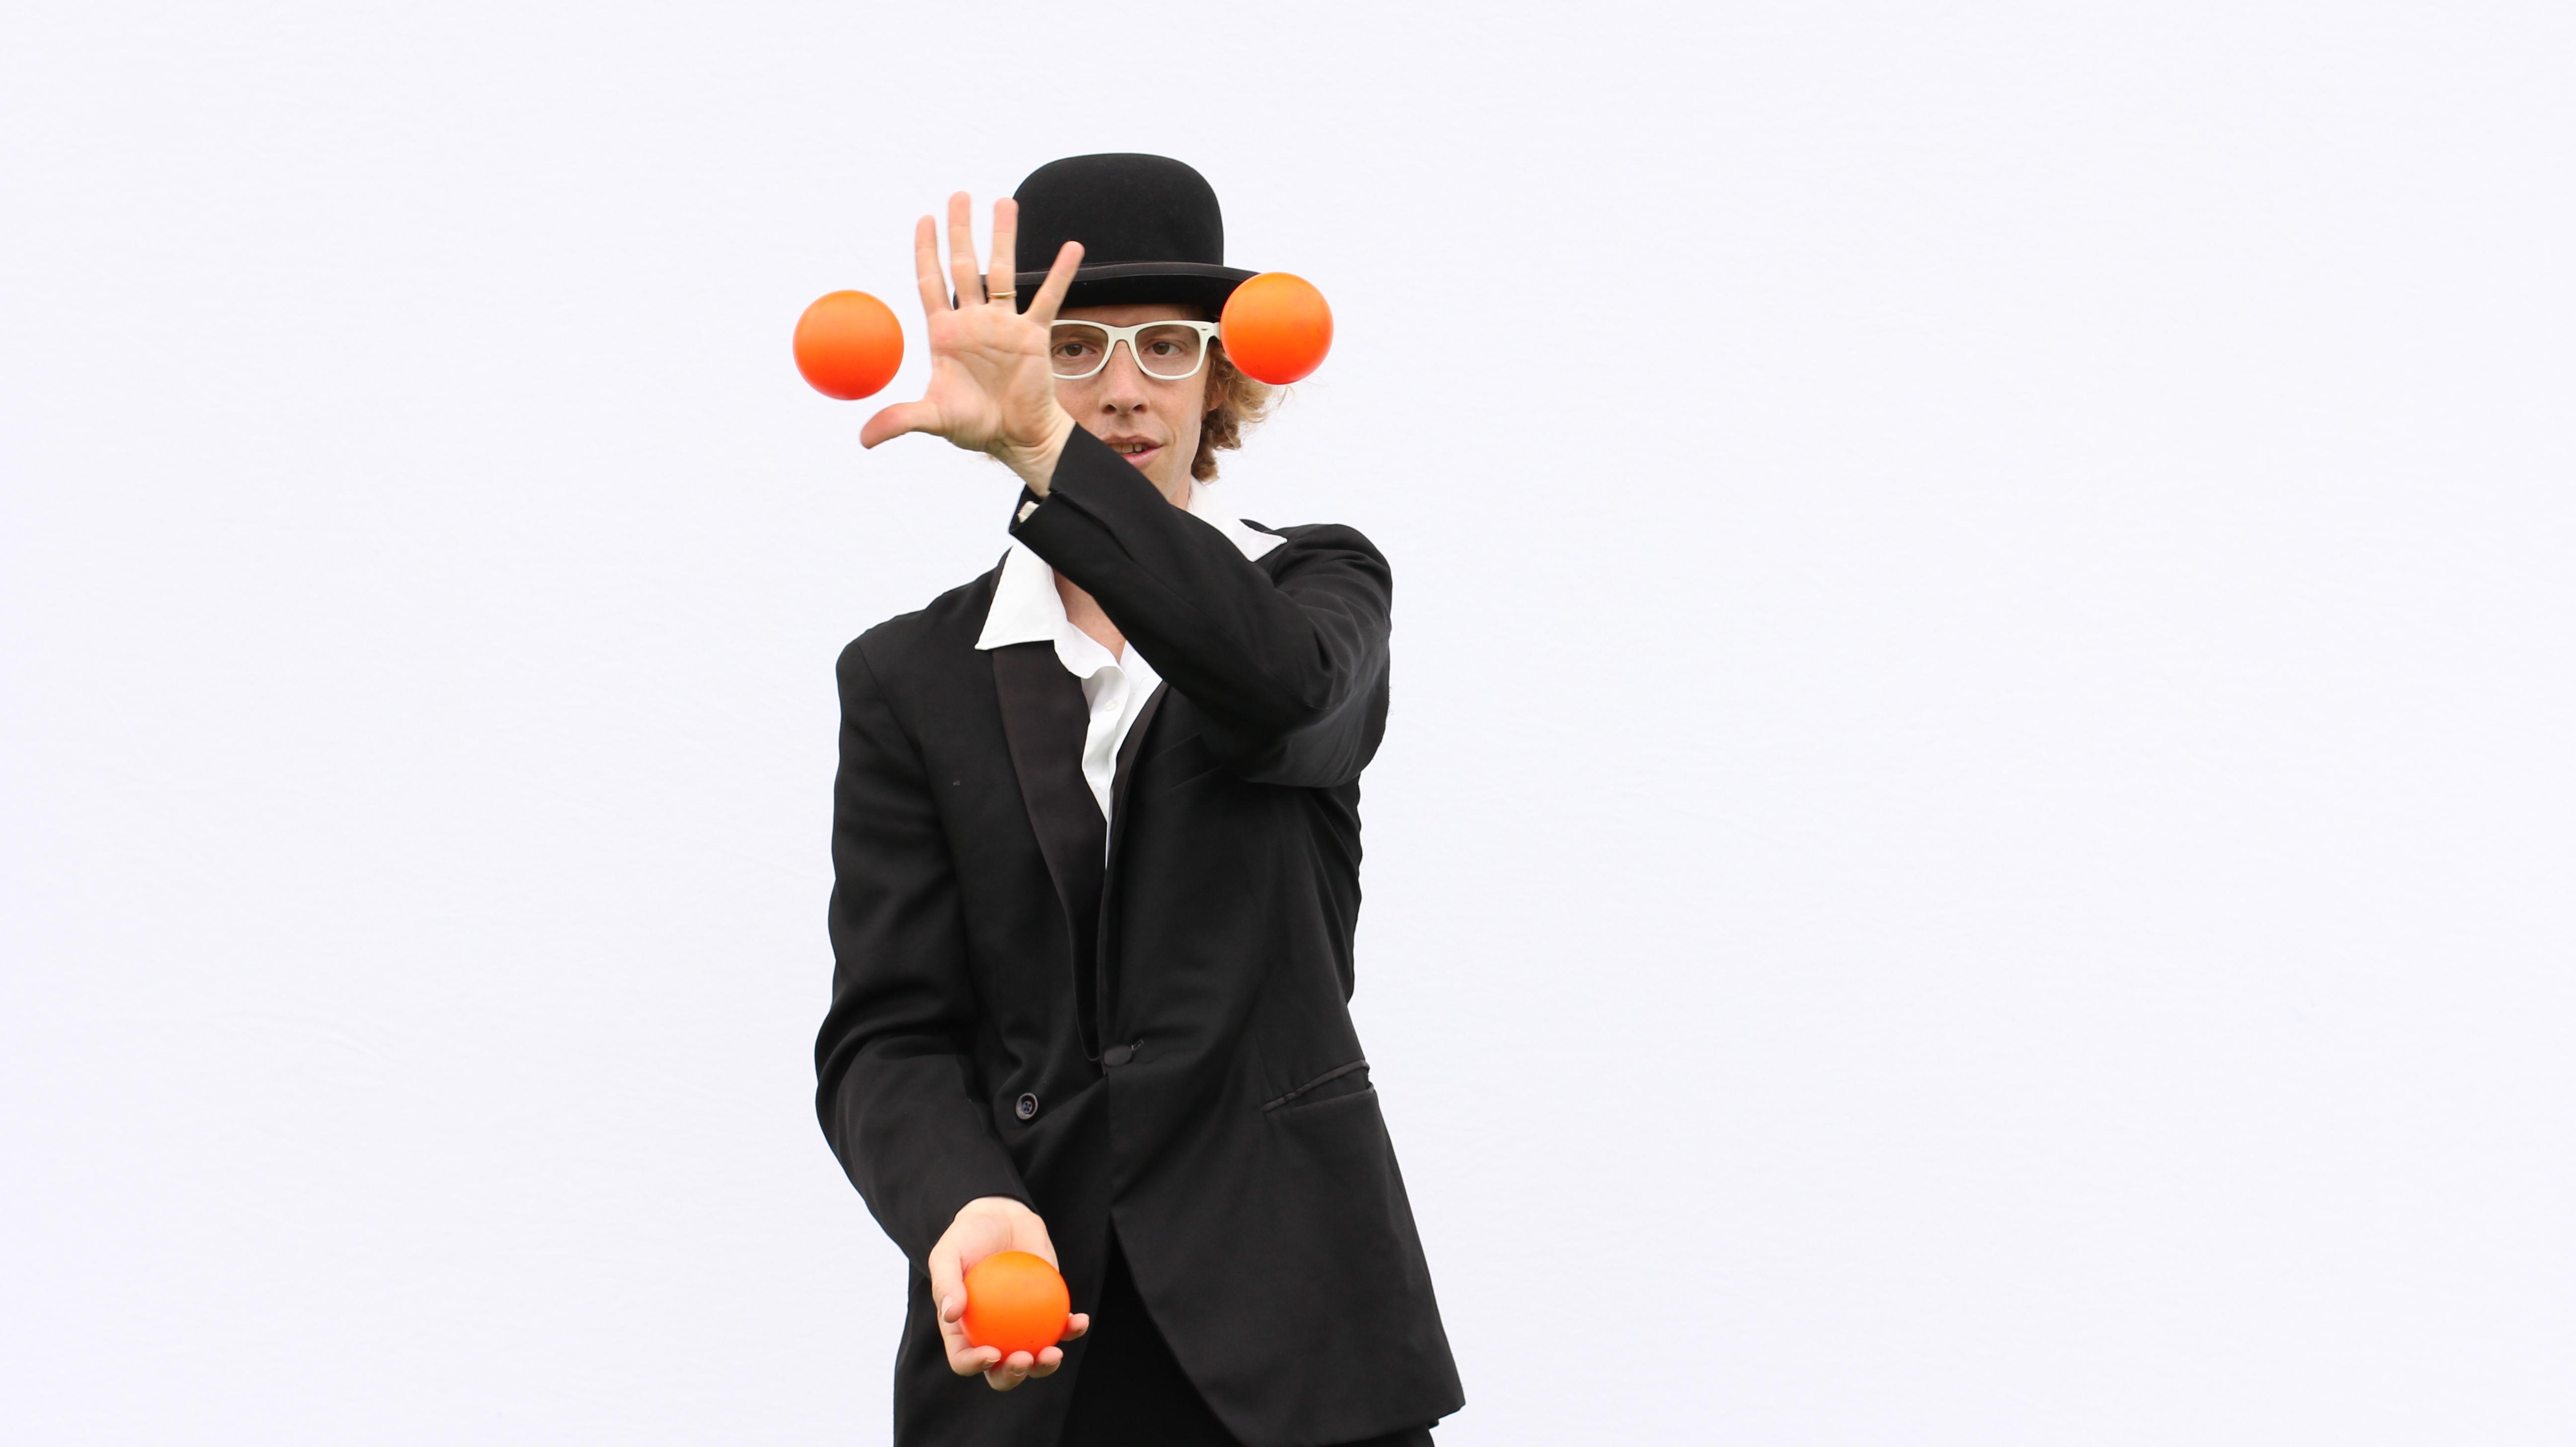 Tom Juggling